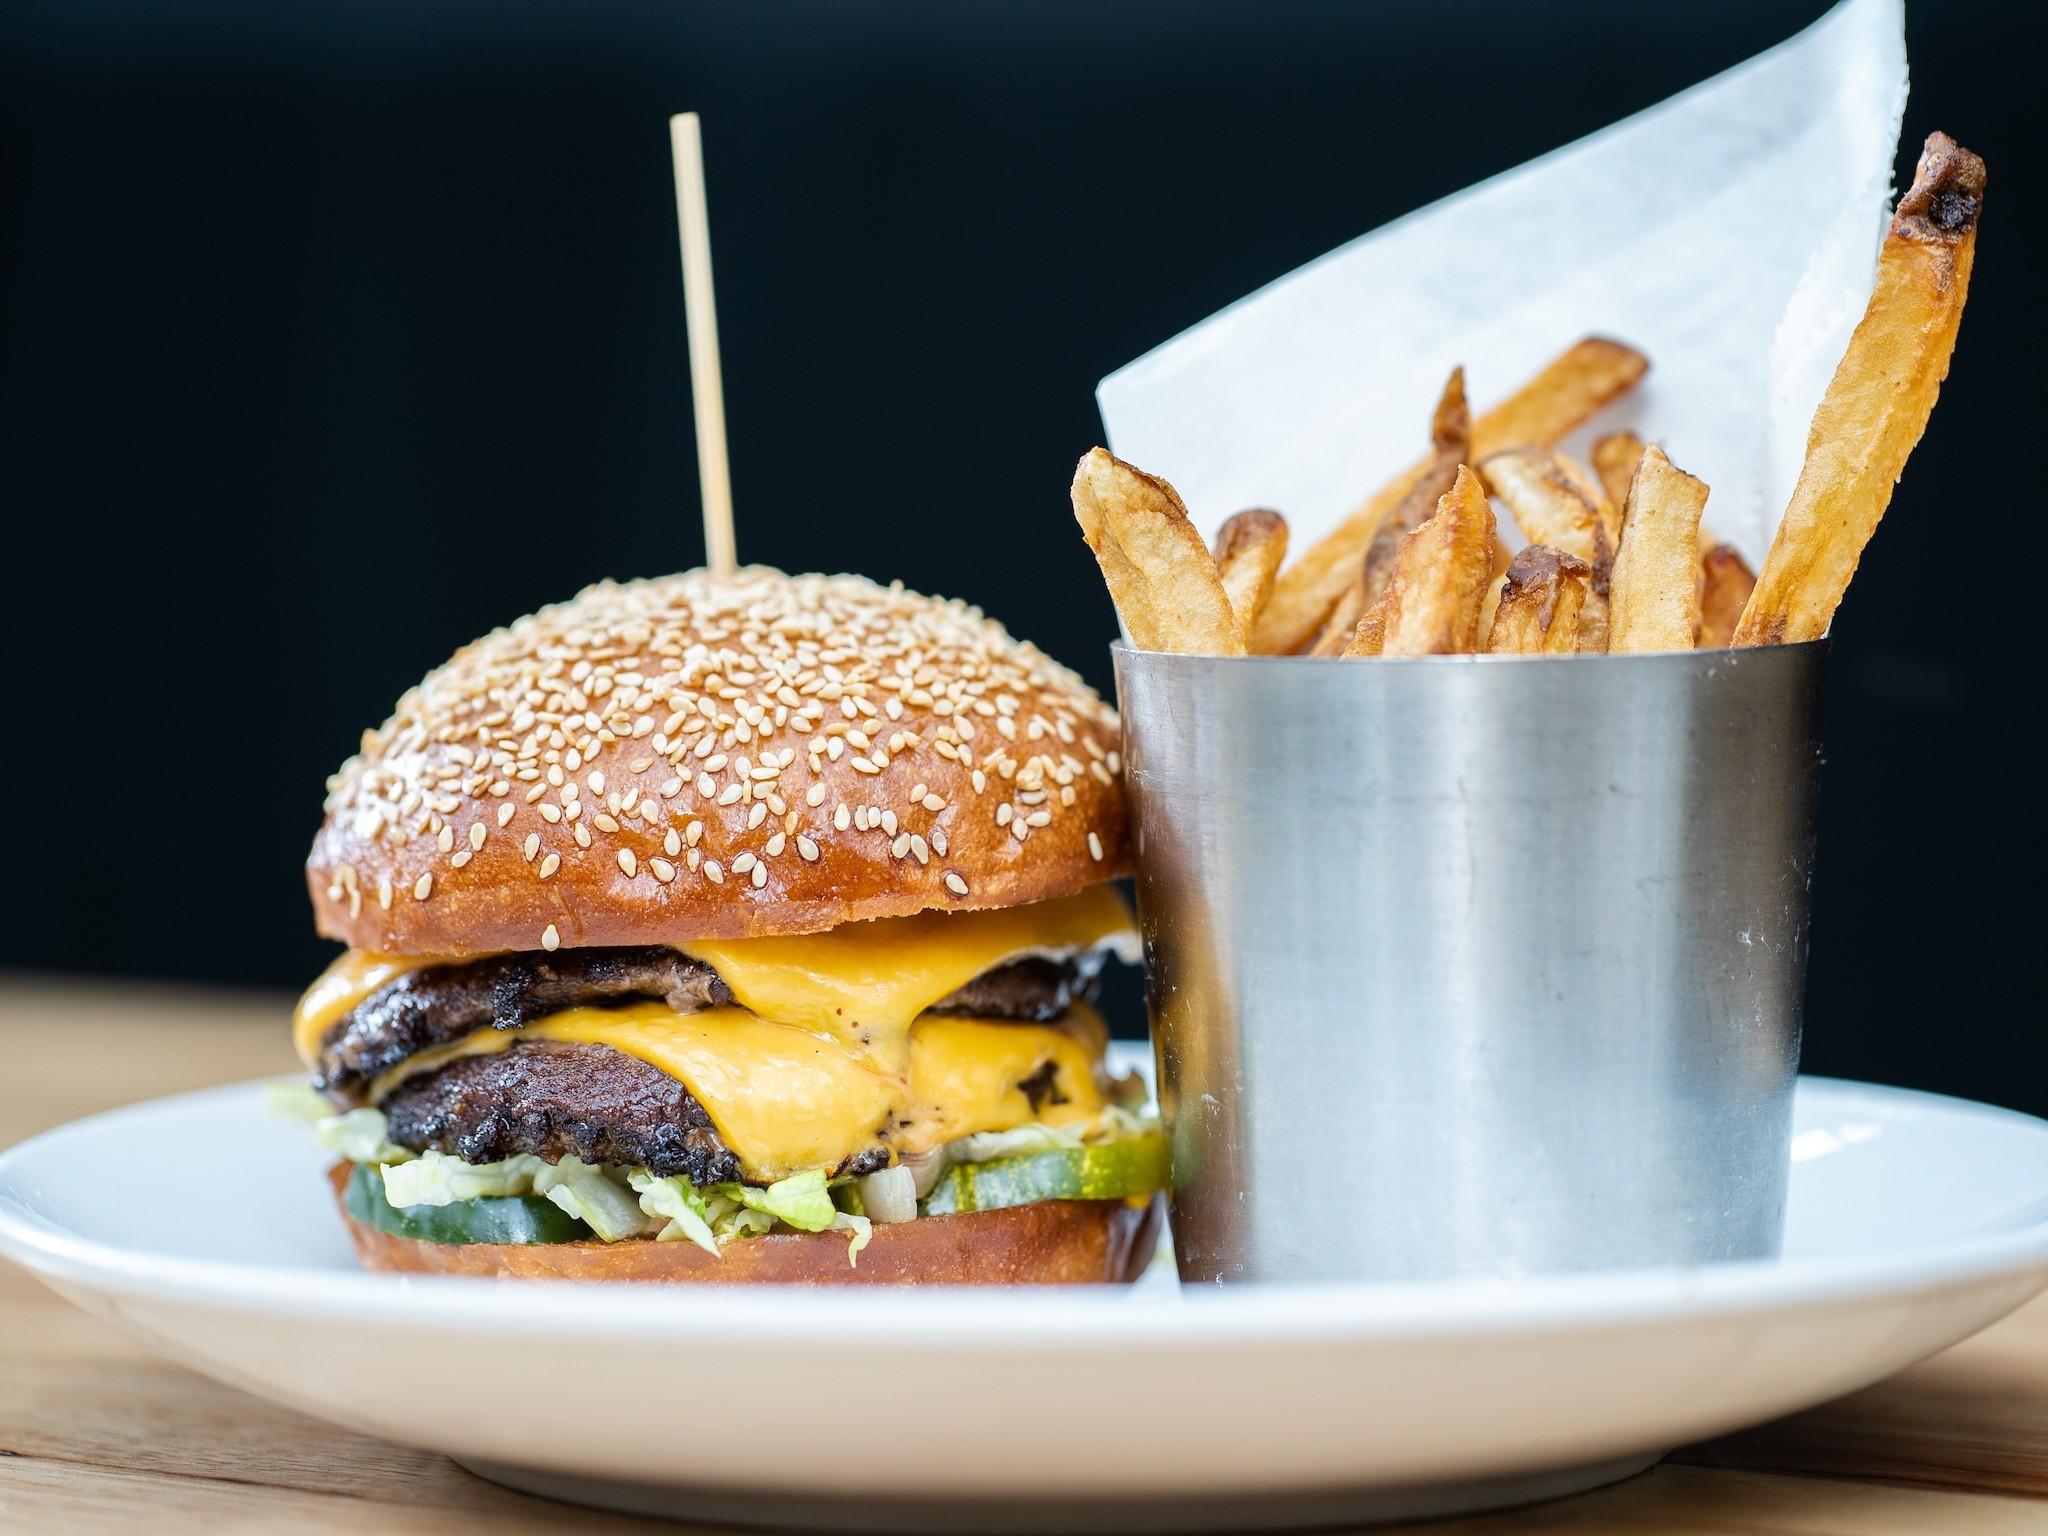 Chug Burger at Ariete